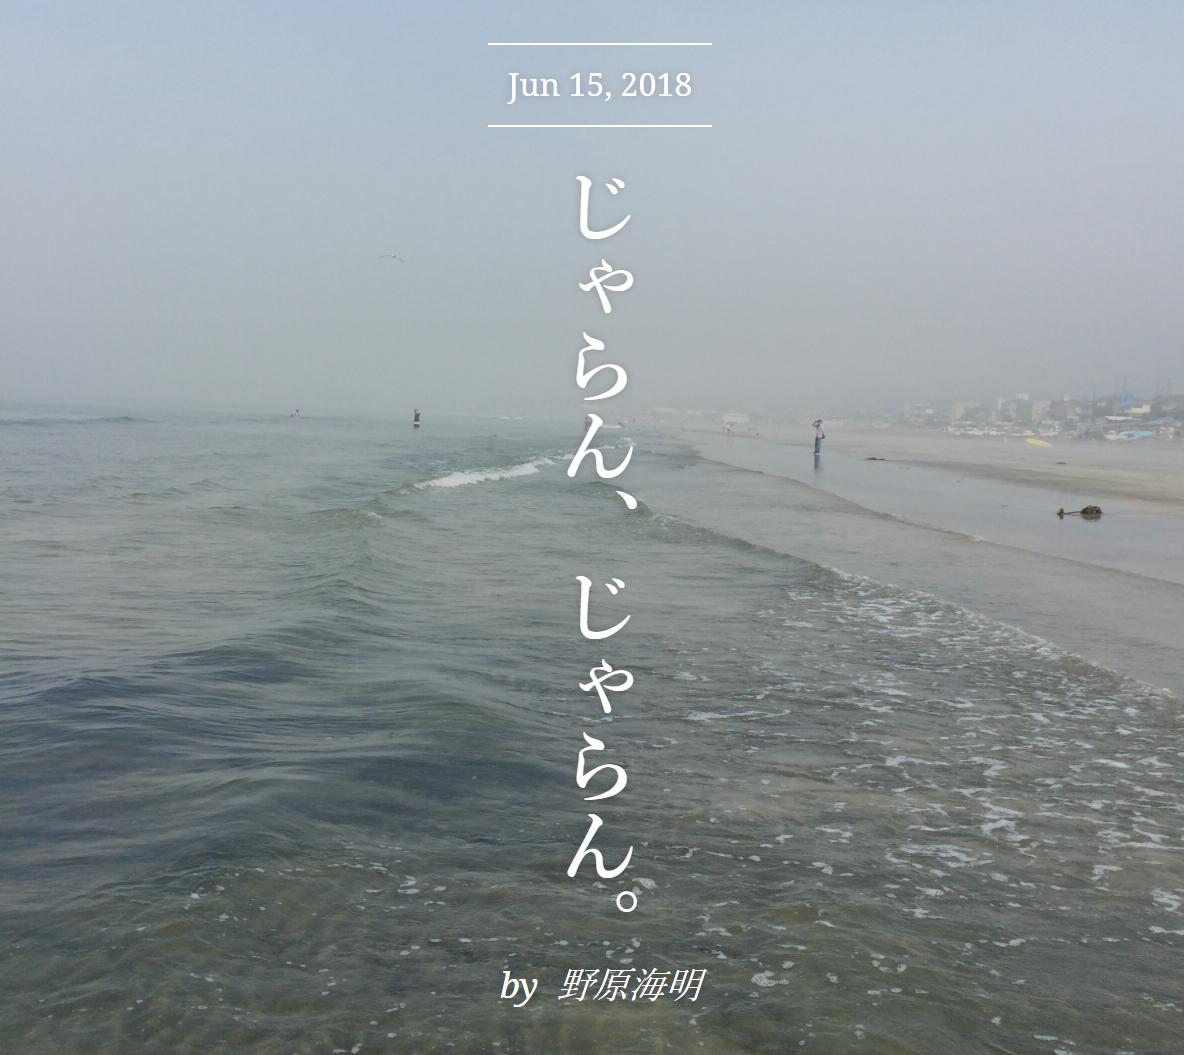 f:id:mia-nohara:20190508142748p:plain